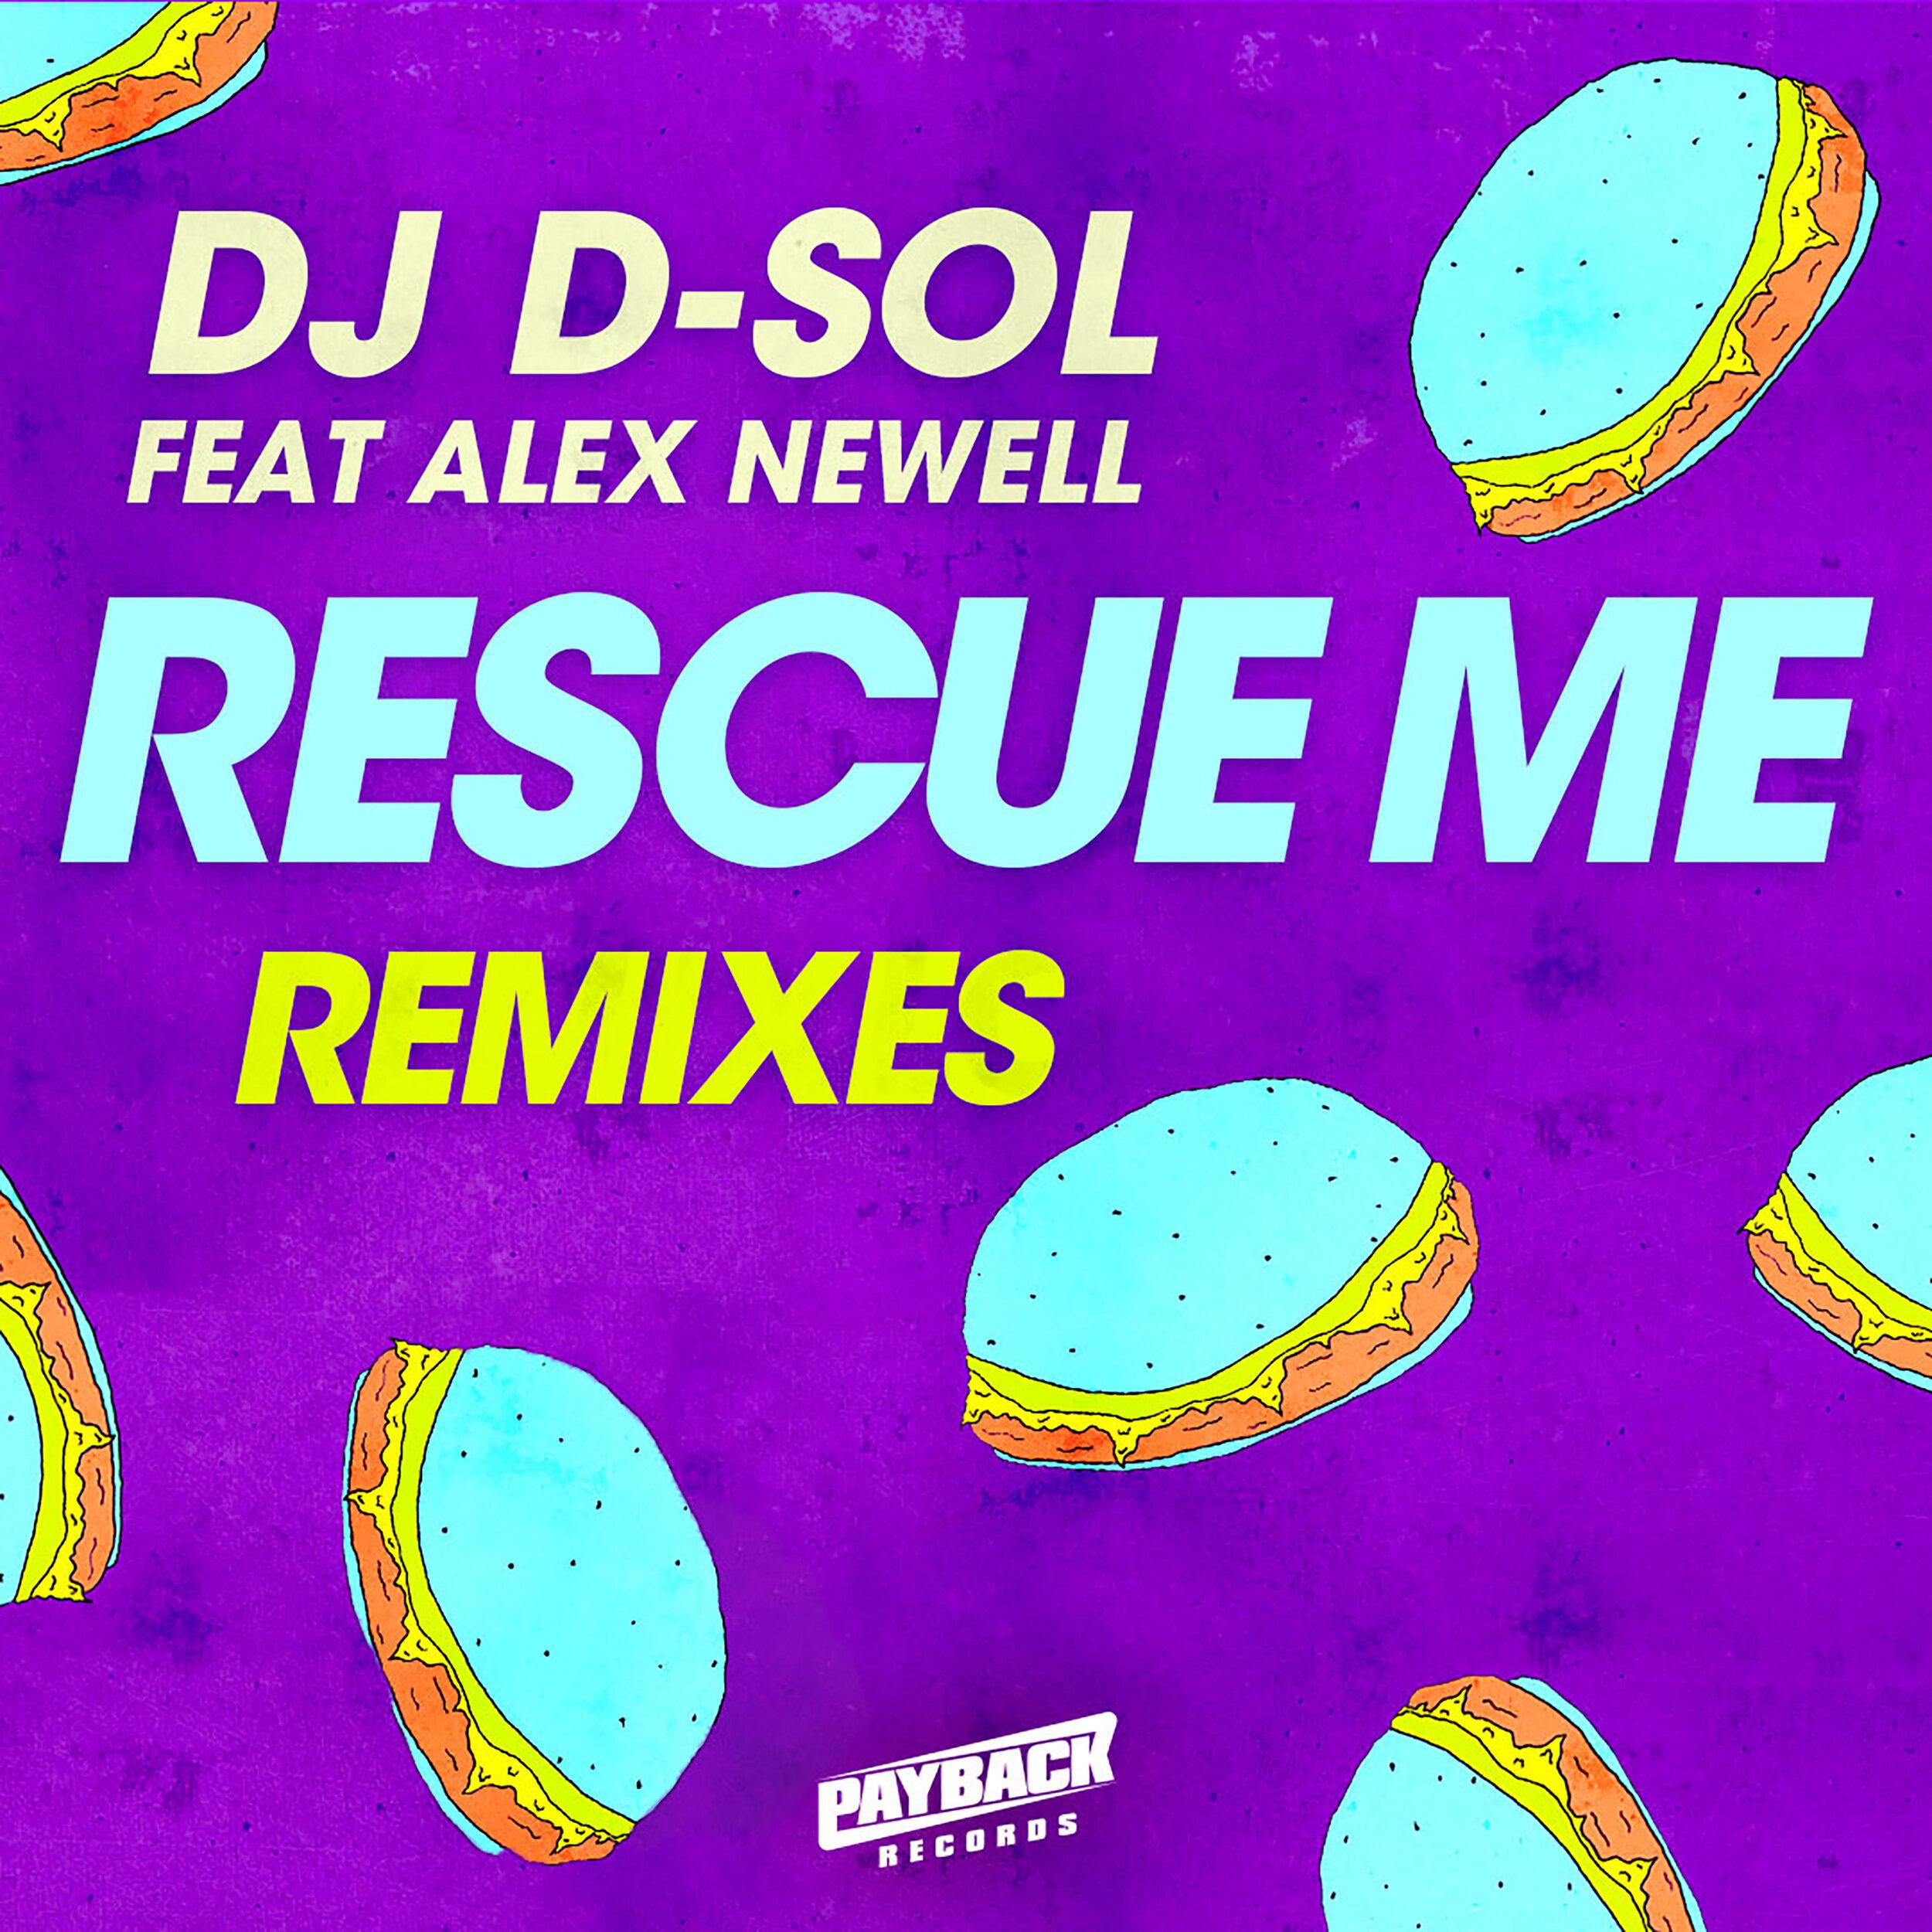 D-Sol_Rescue-Me_REMIX PACK_3K.jpg